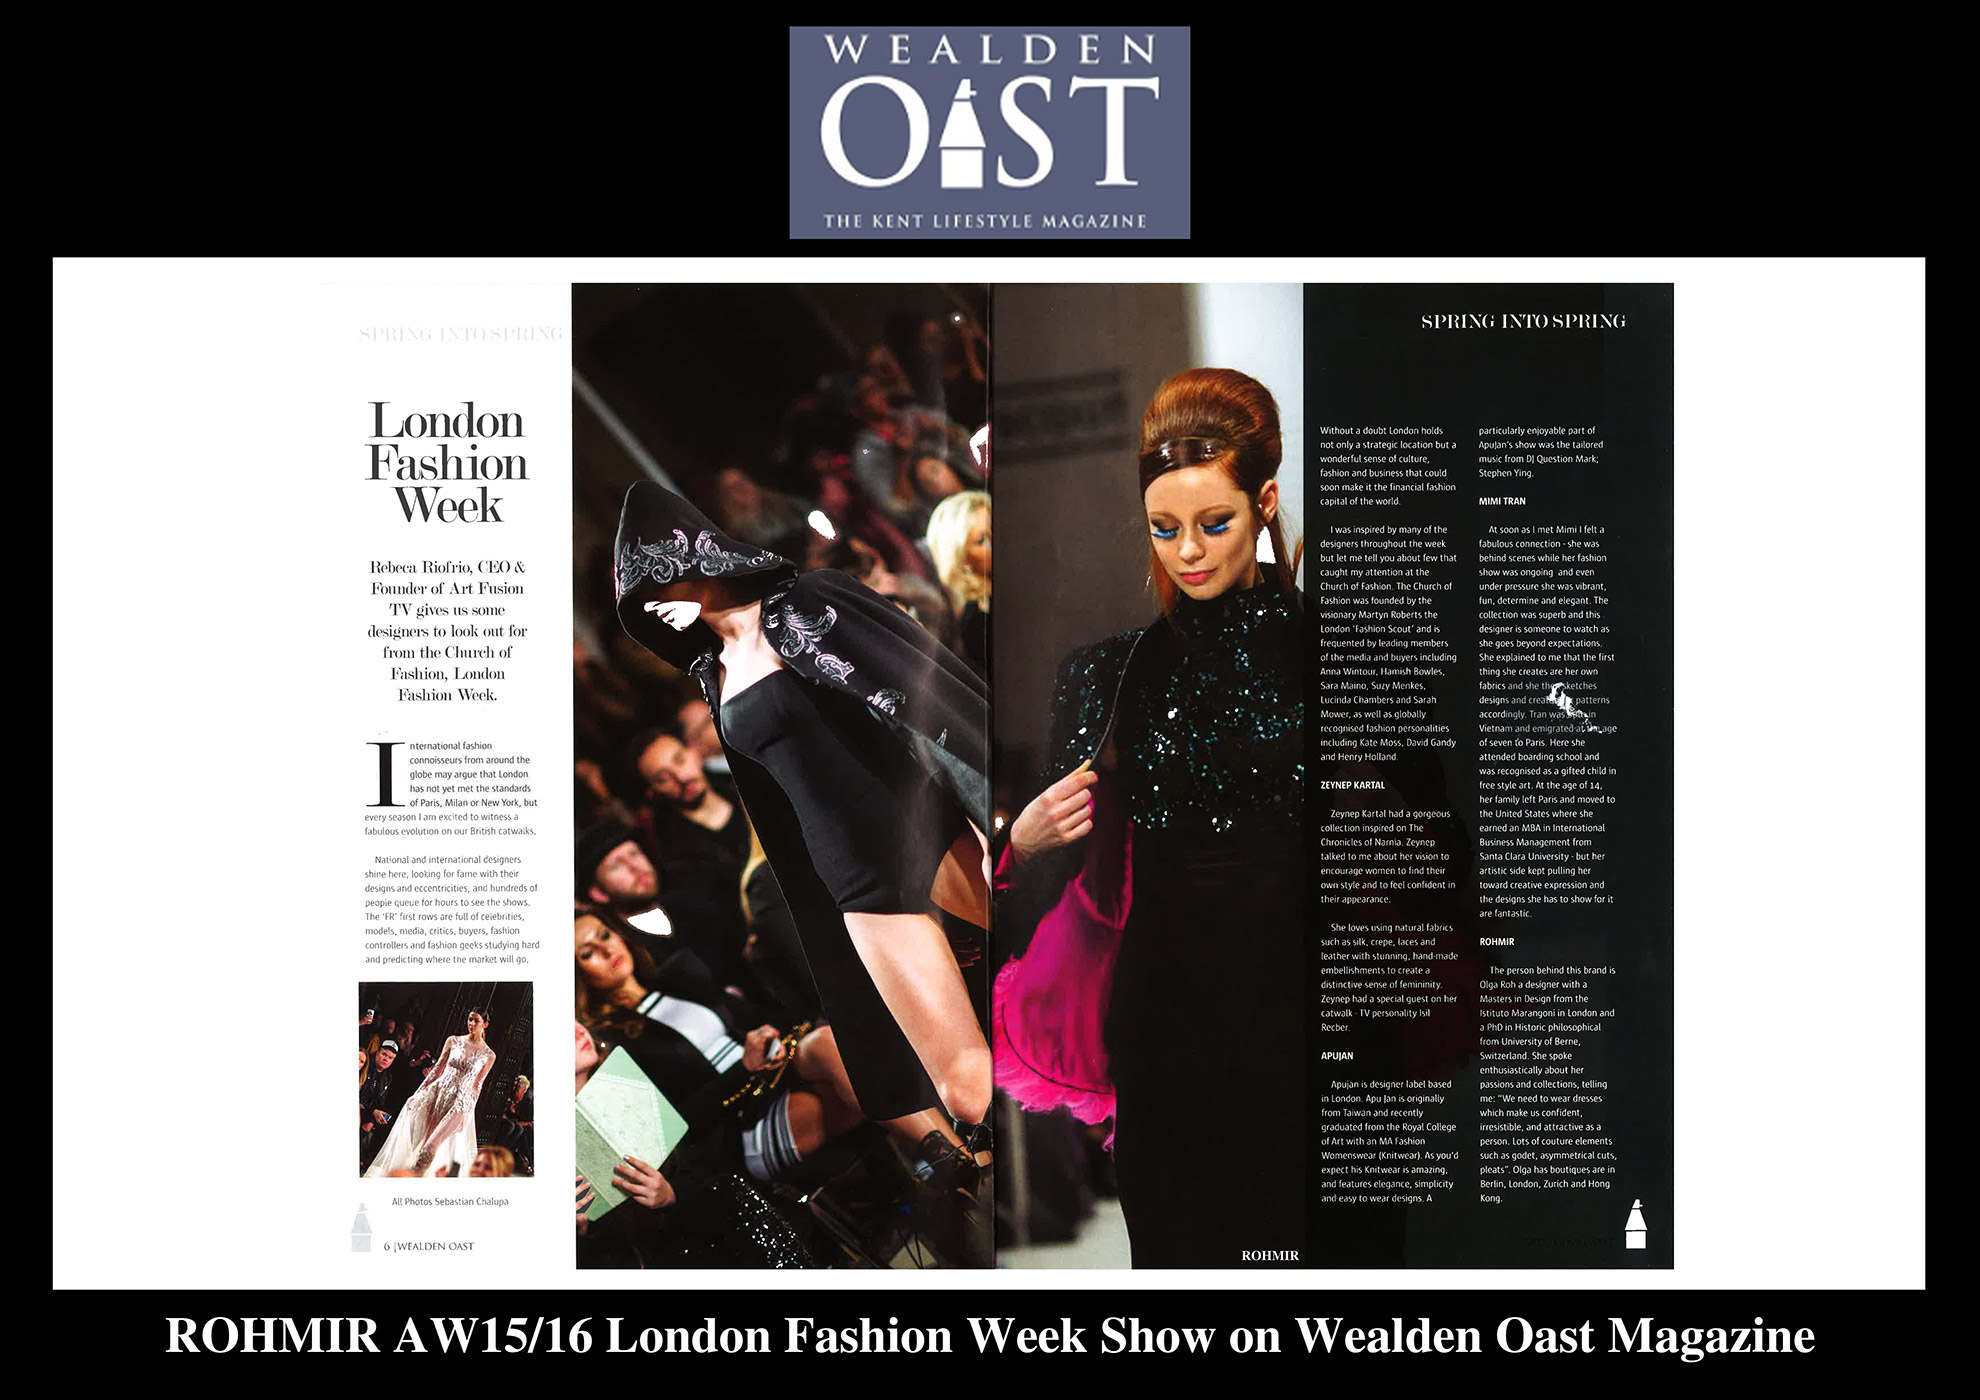 ROHMIR-AW15-16-London-Fashion-Week-Show-on-Wealden-Oast-Magazine